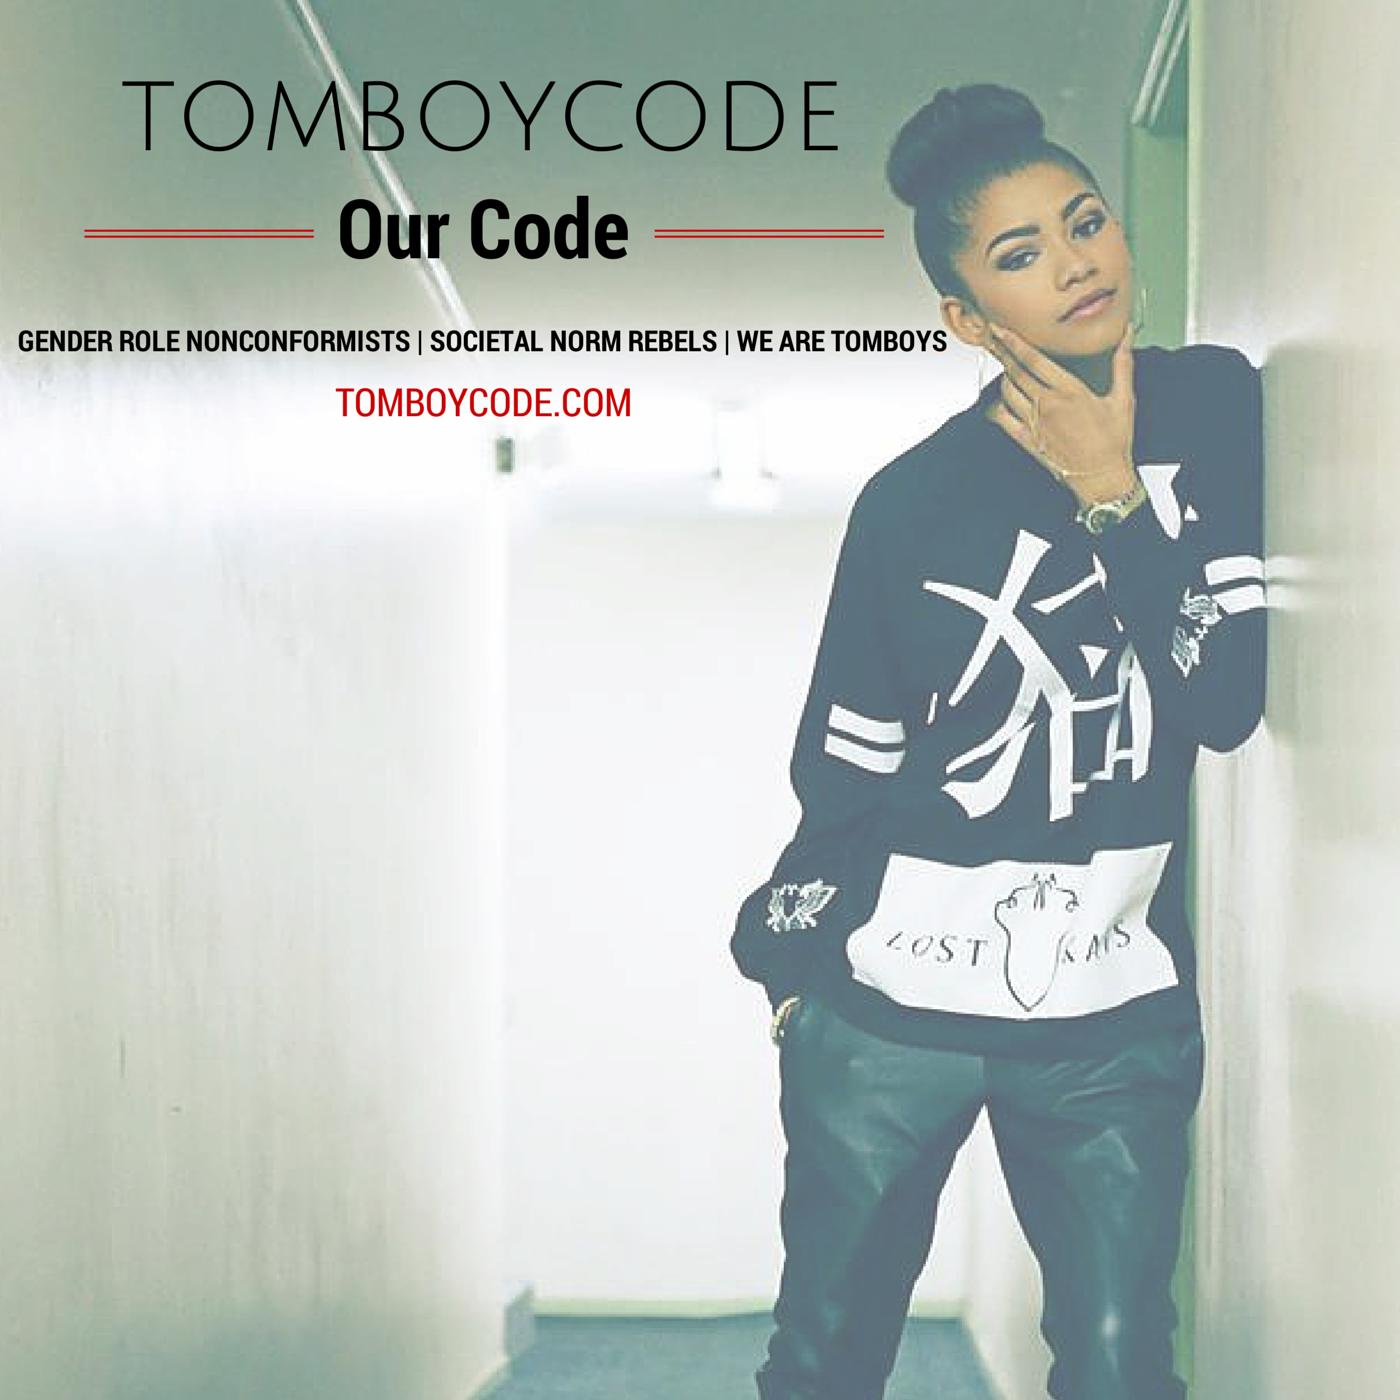 Tumblr Girl Fashion Quotes Tomboy Code Fy Tomboy Fashion